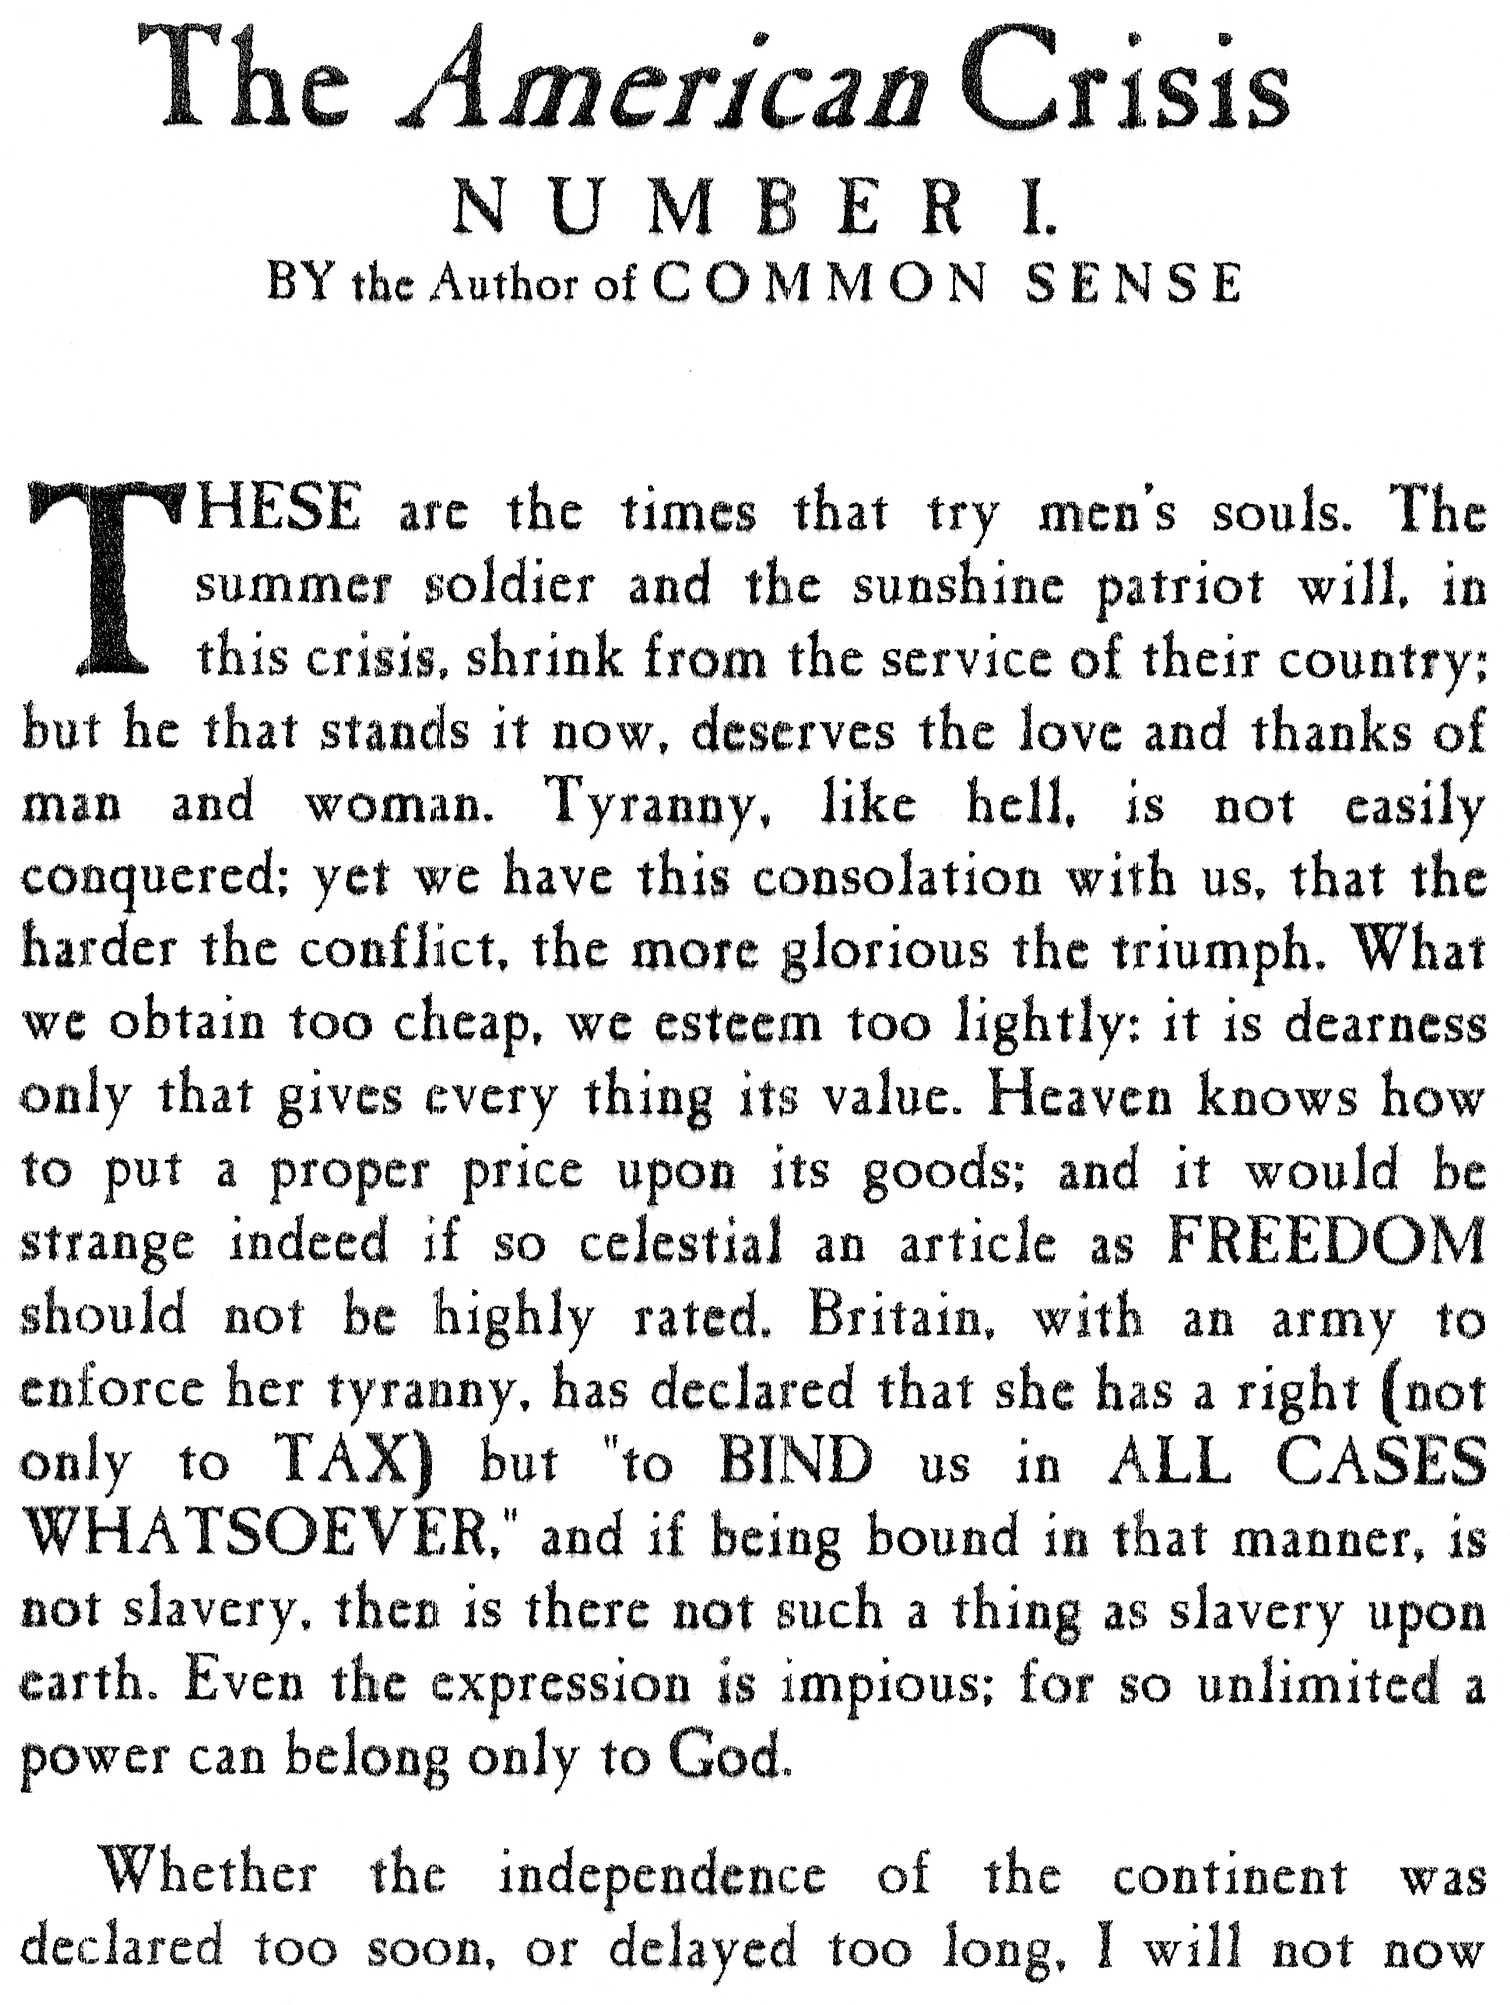 American Crisis, #1, 1776